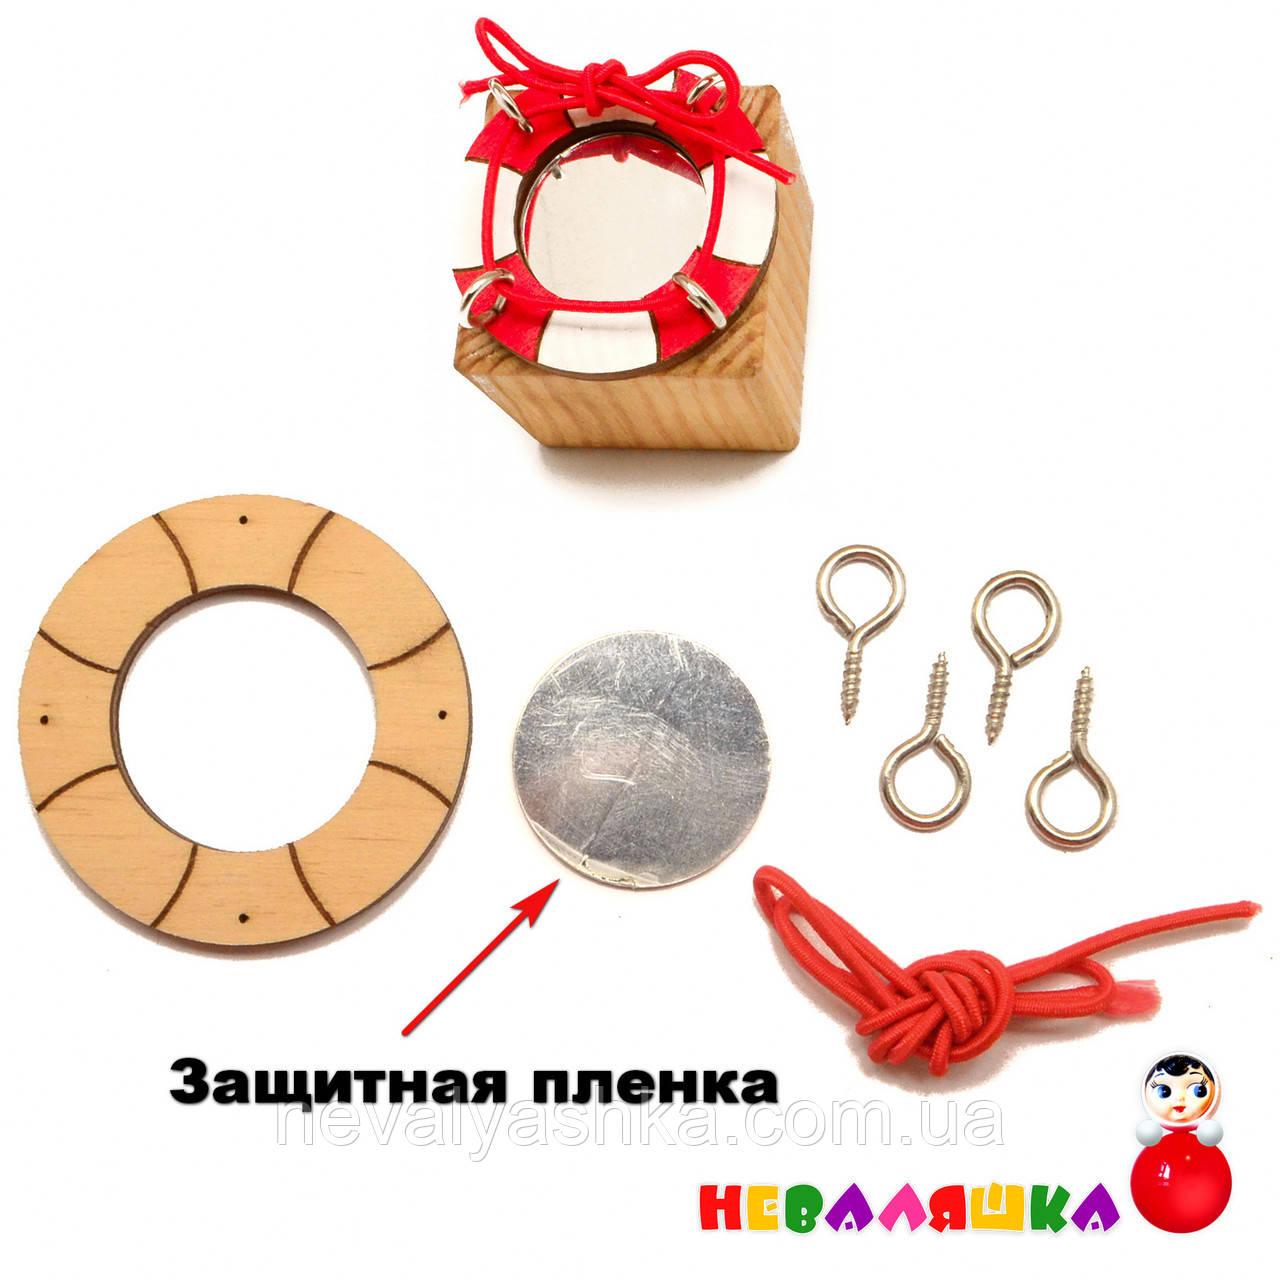 Заготовка для Бизикубика Шнуровка Спасательный Круг 4,8 см + Зеркало Рятувальний Круг + Дзекало бізікубика